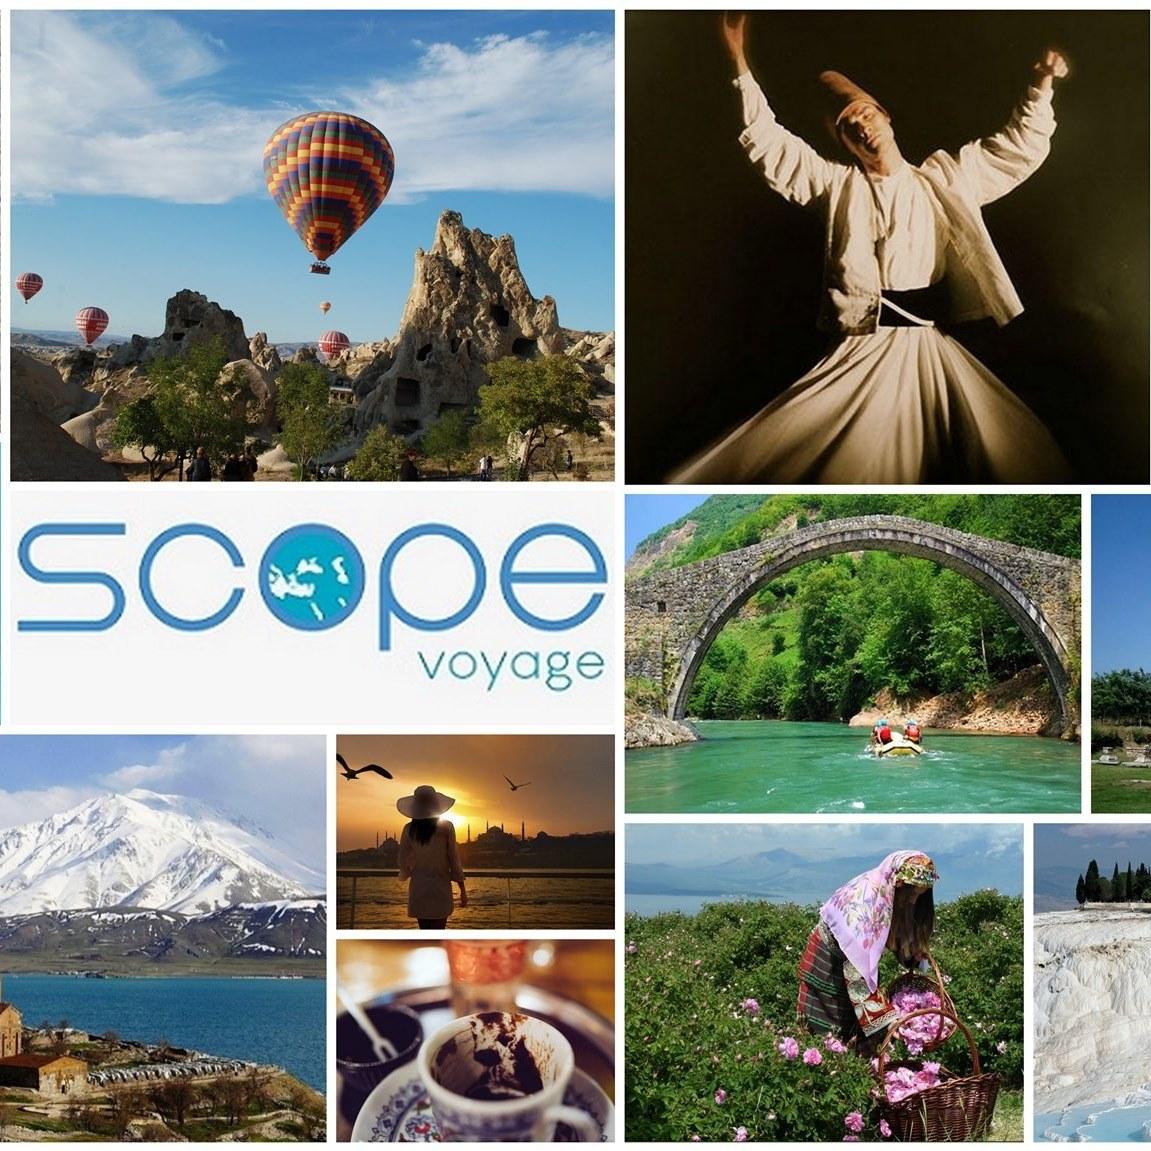 Scope Voyage Turquie